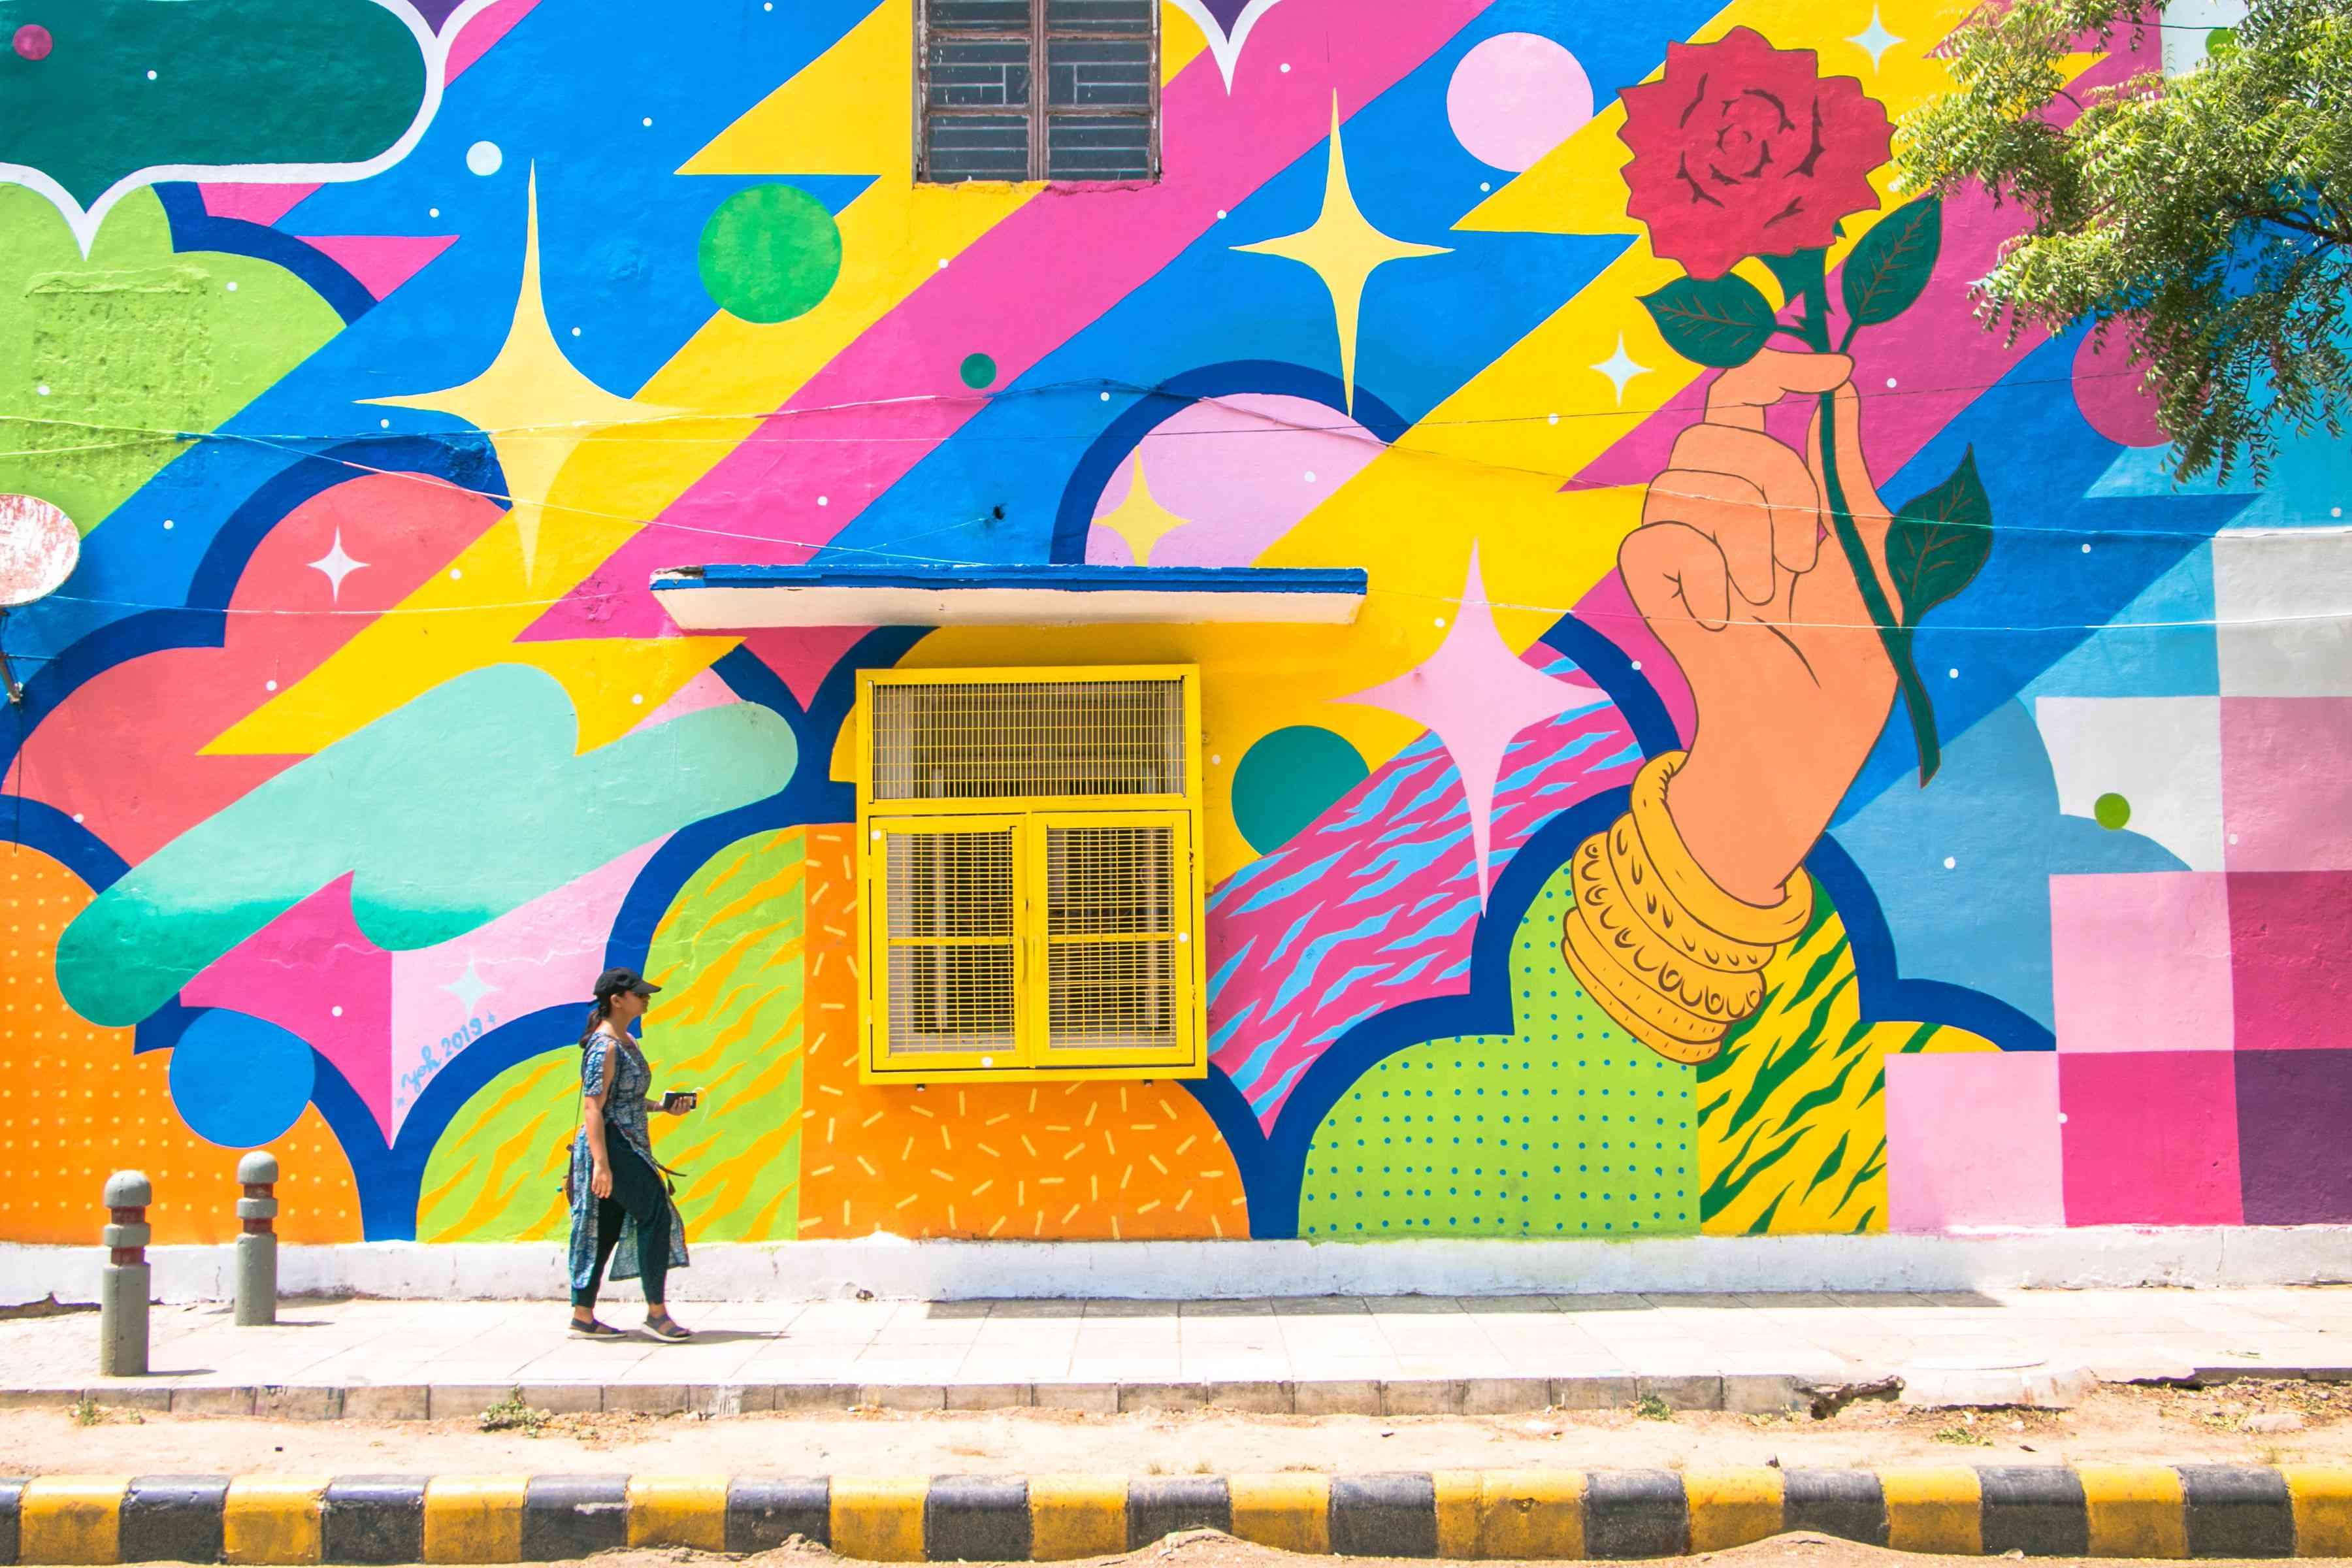 Street mural in Lodhi Colony